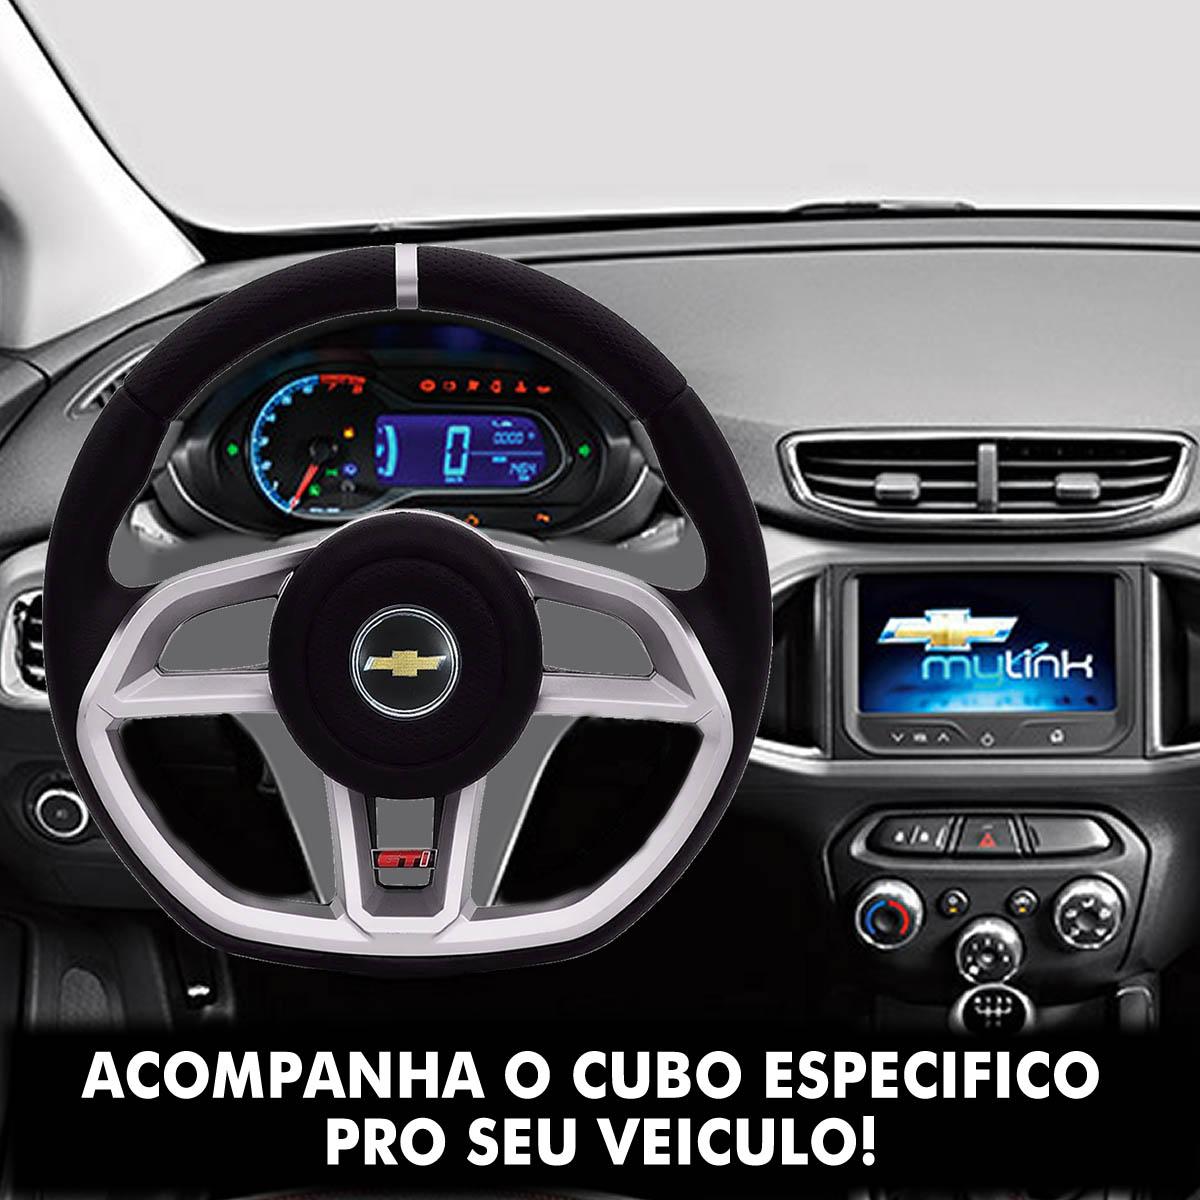 Volante Chevrolet Gti Esportivo Cubo S10 Blazer Silverado 1995 a 2013 Opala Chevette 1968 a 1998 Poliparts